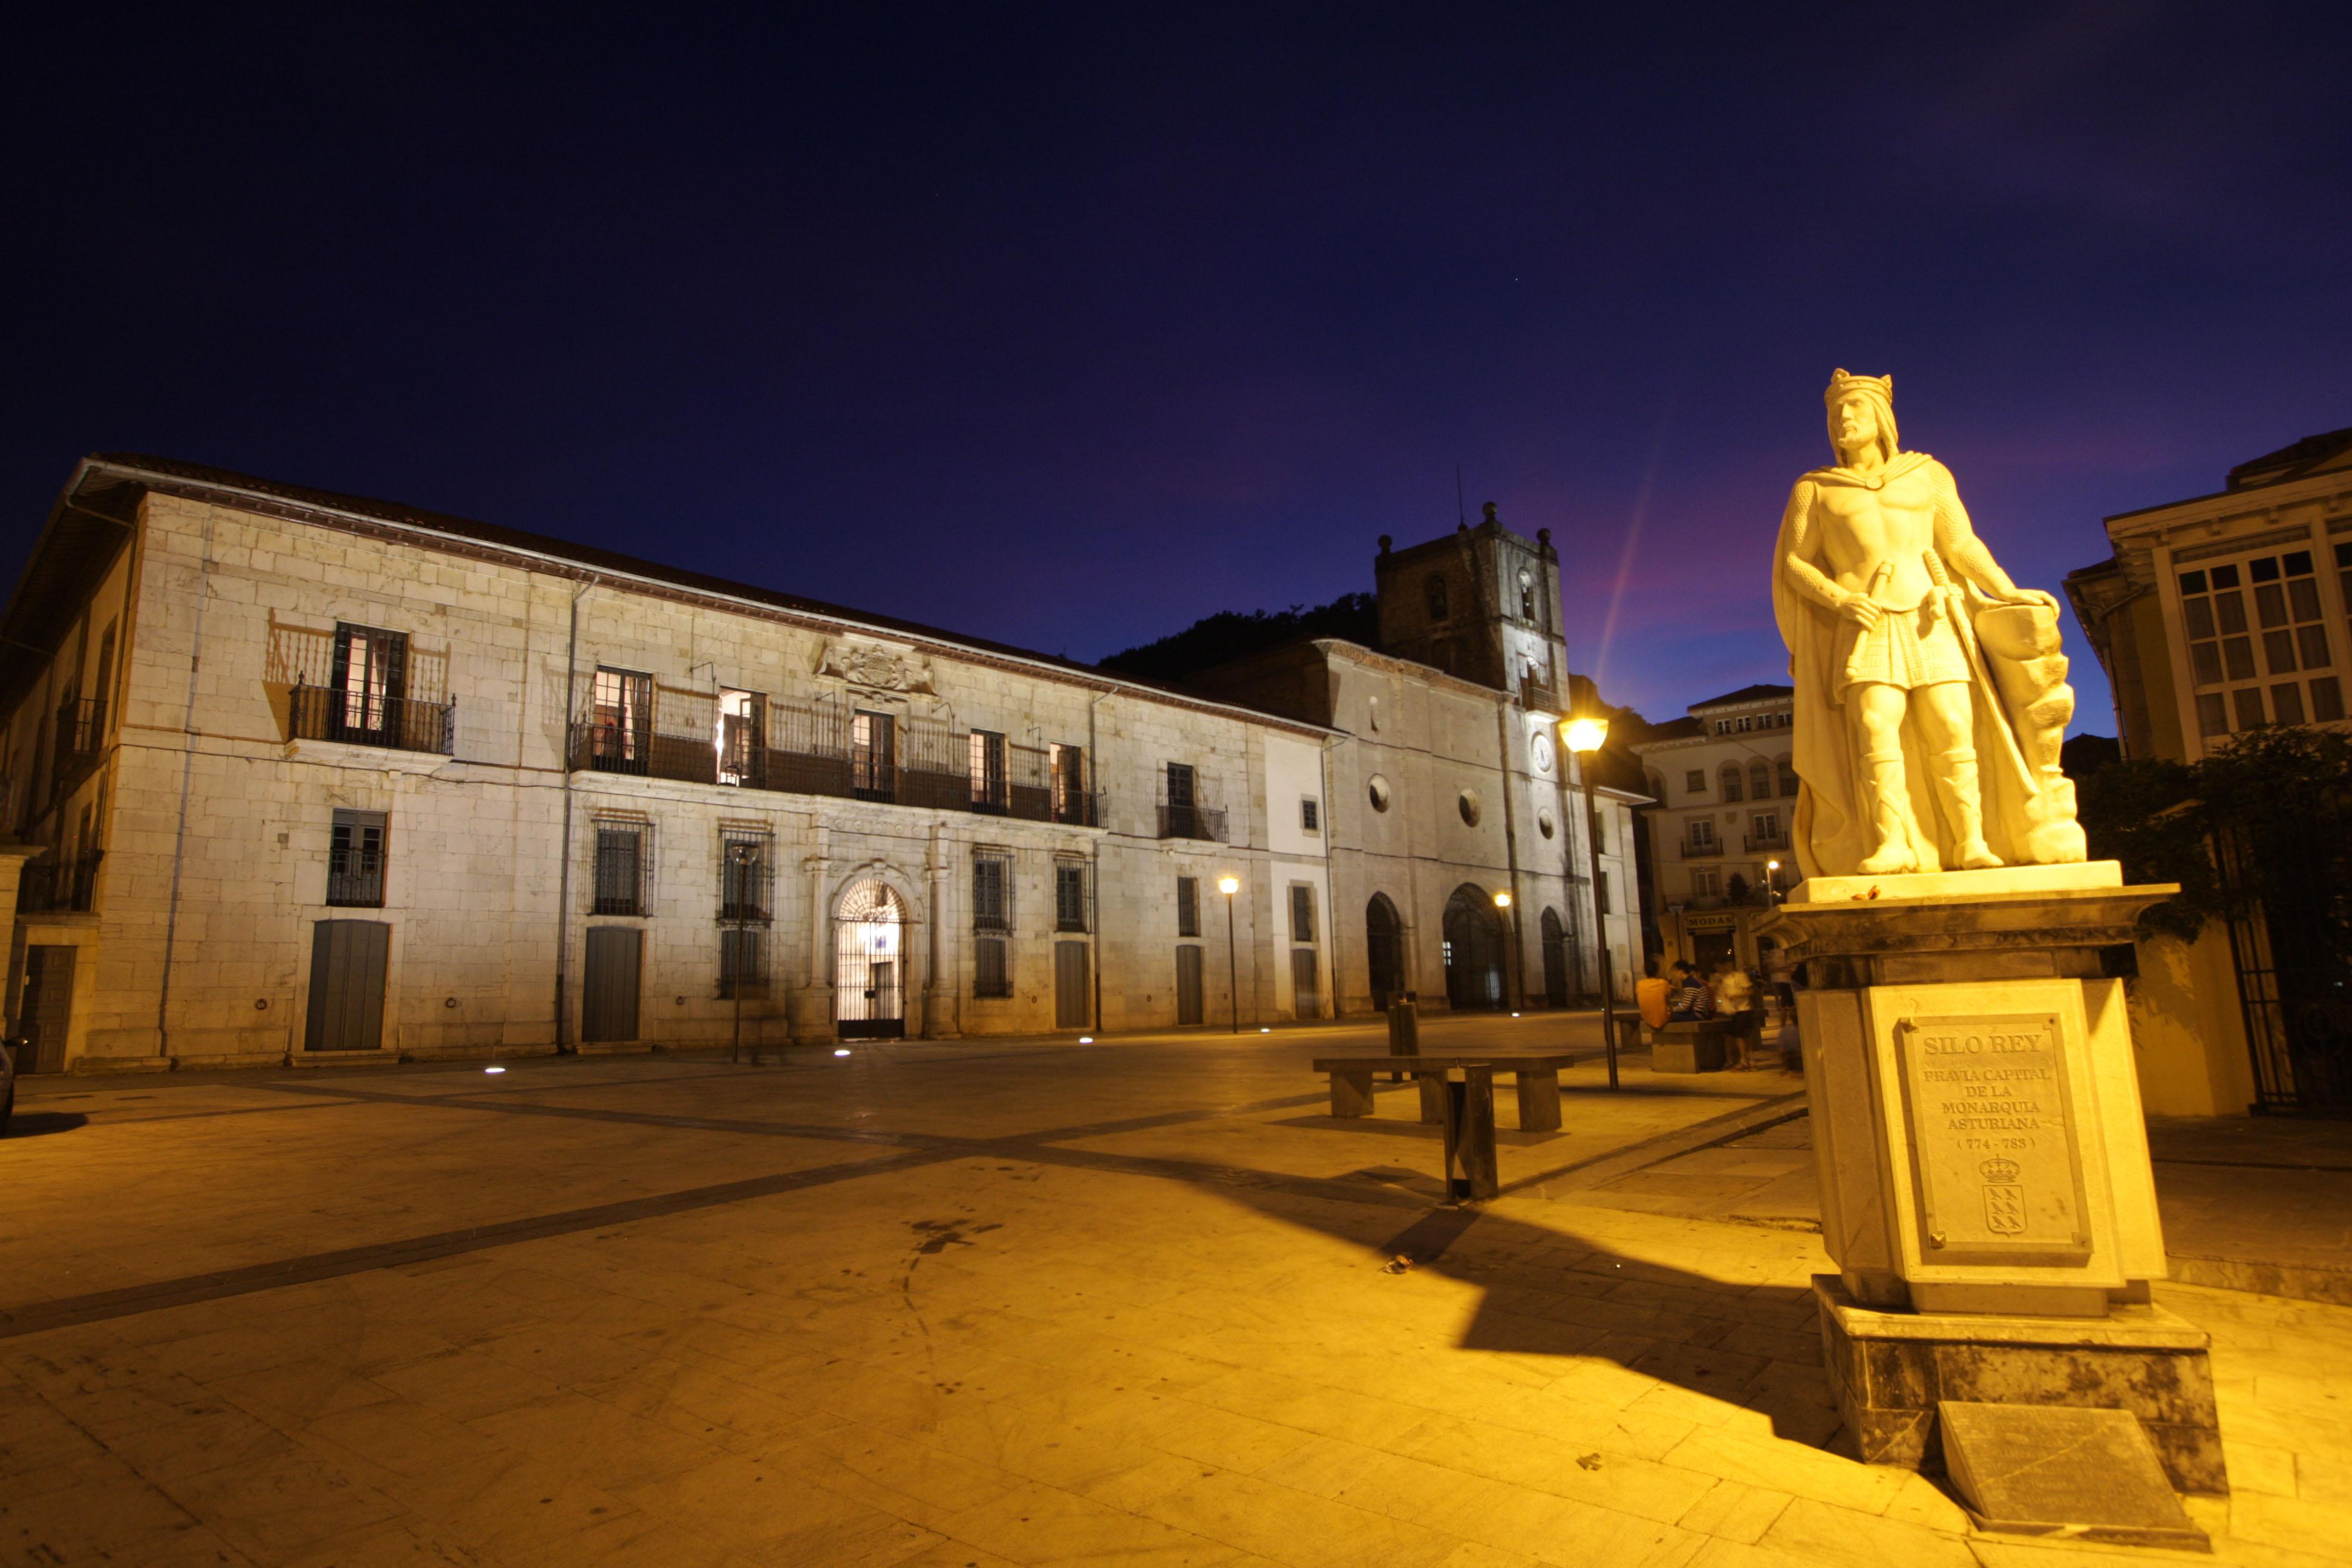 Pravia hotel casona del busto pravia - Hotel pueblo astur ...